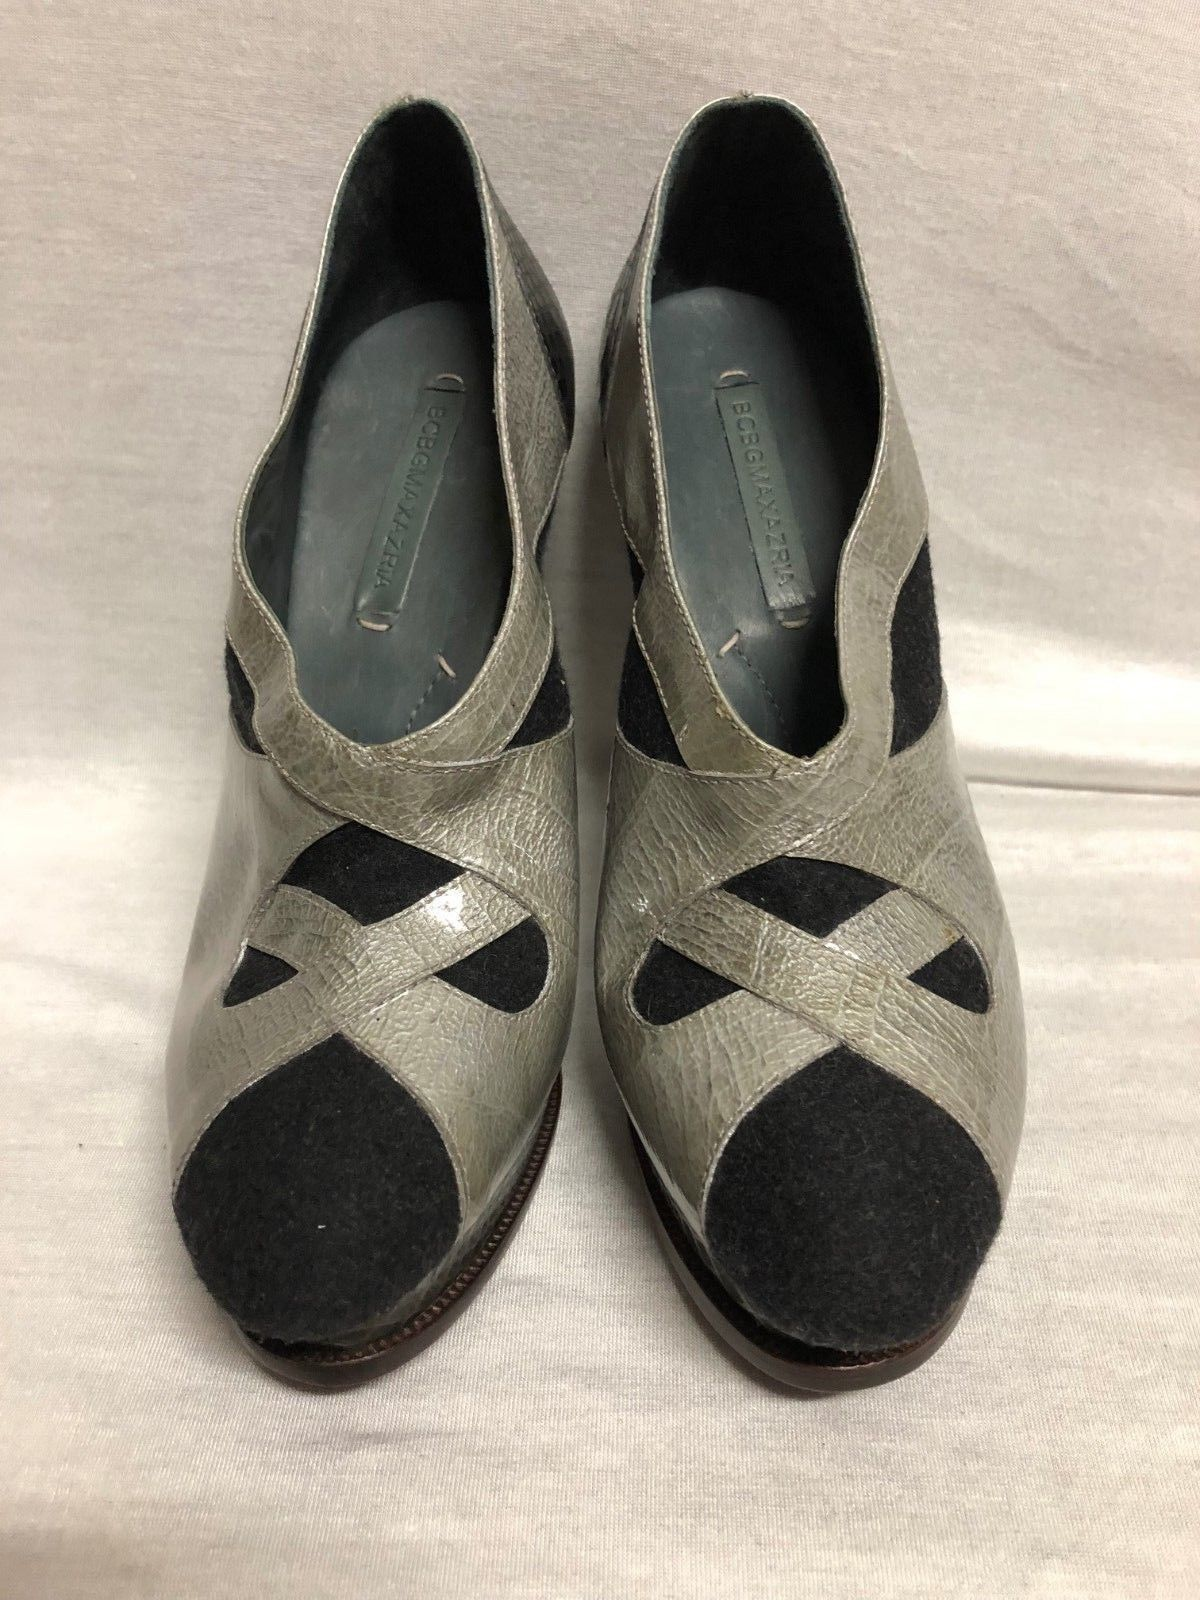 BCBG MAXAZRIA SHOES Platform Heel Nivea Black Gray Shiny suede  Size: 10B/40